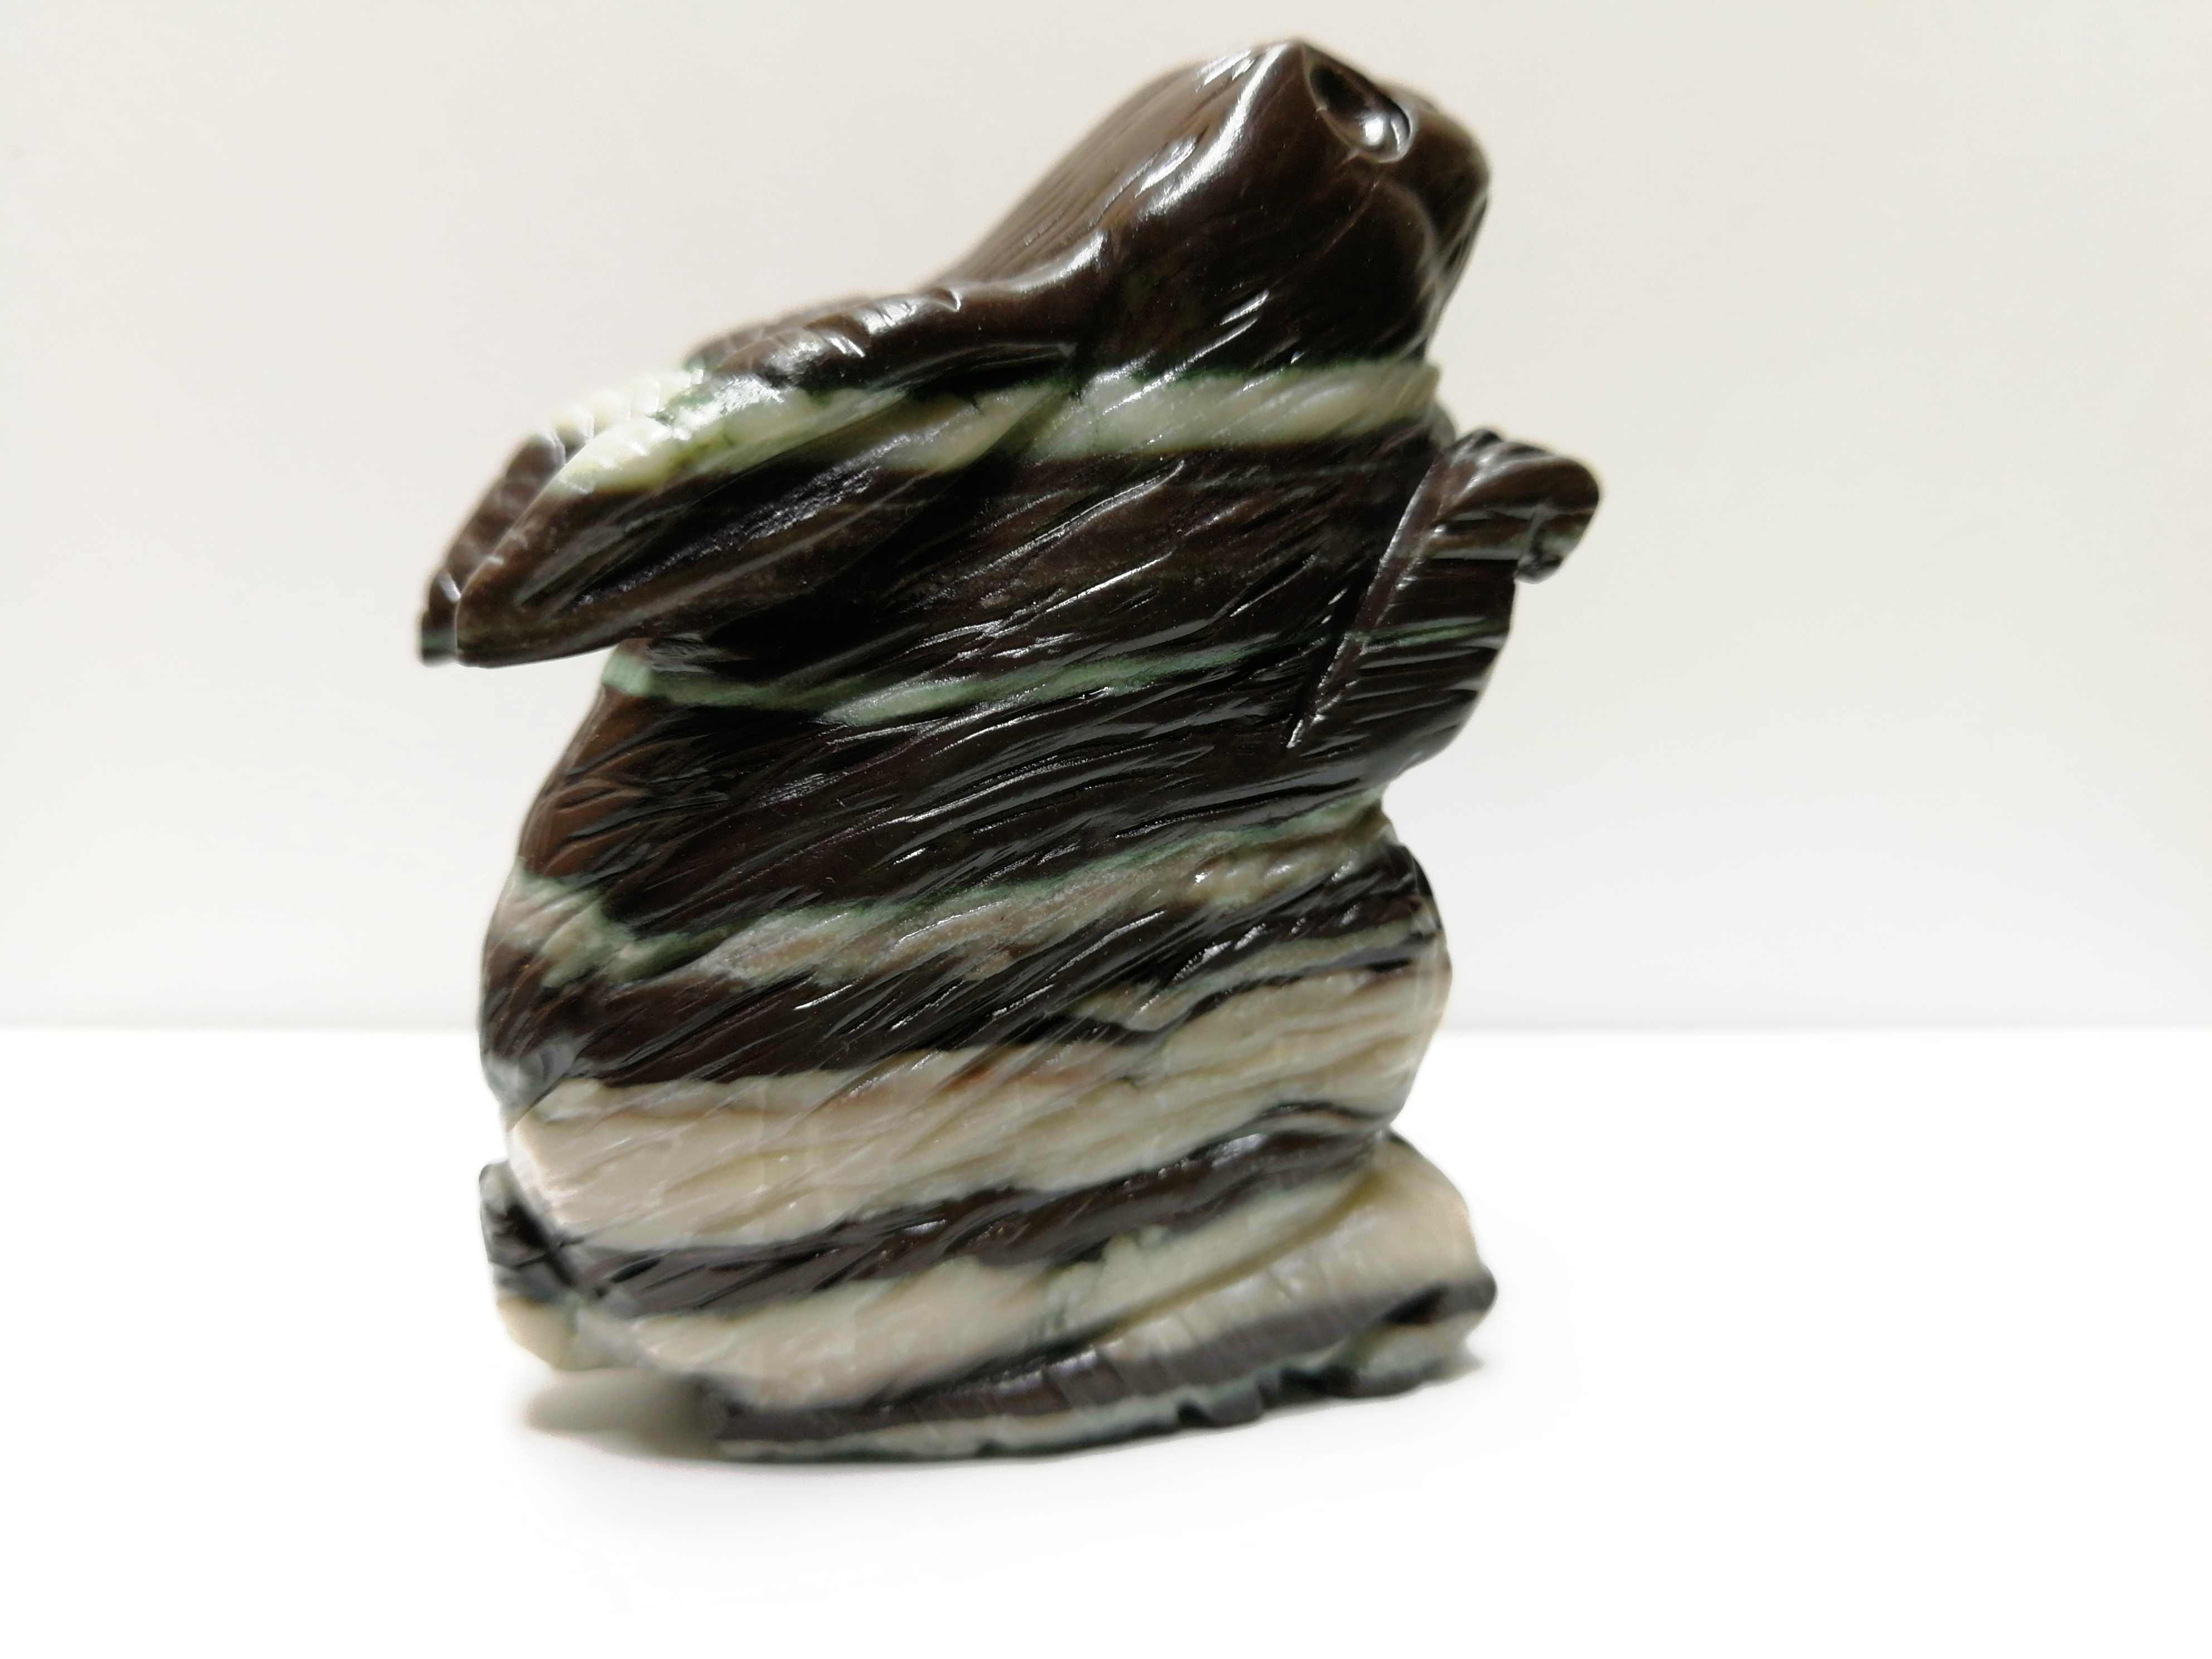 97.8 Gnatural Zebra Batu Kristal Diukir dengan Tangan Kelinci Ukiran Sihir Batu Energi